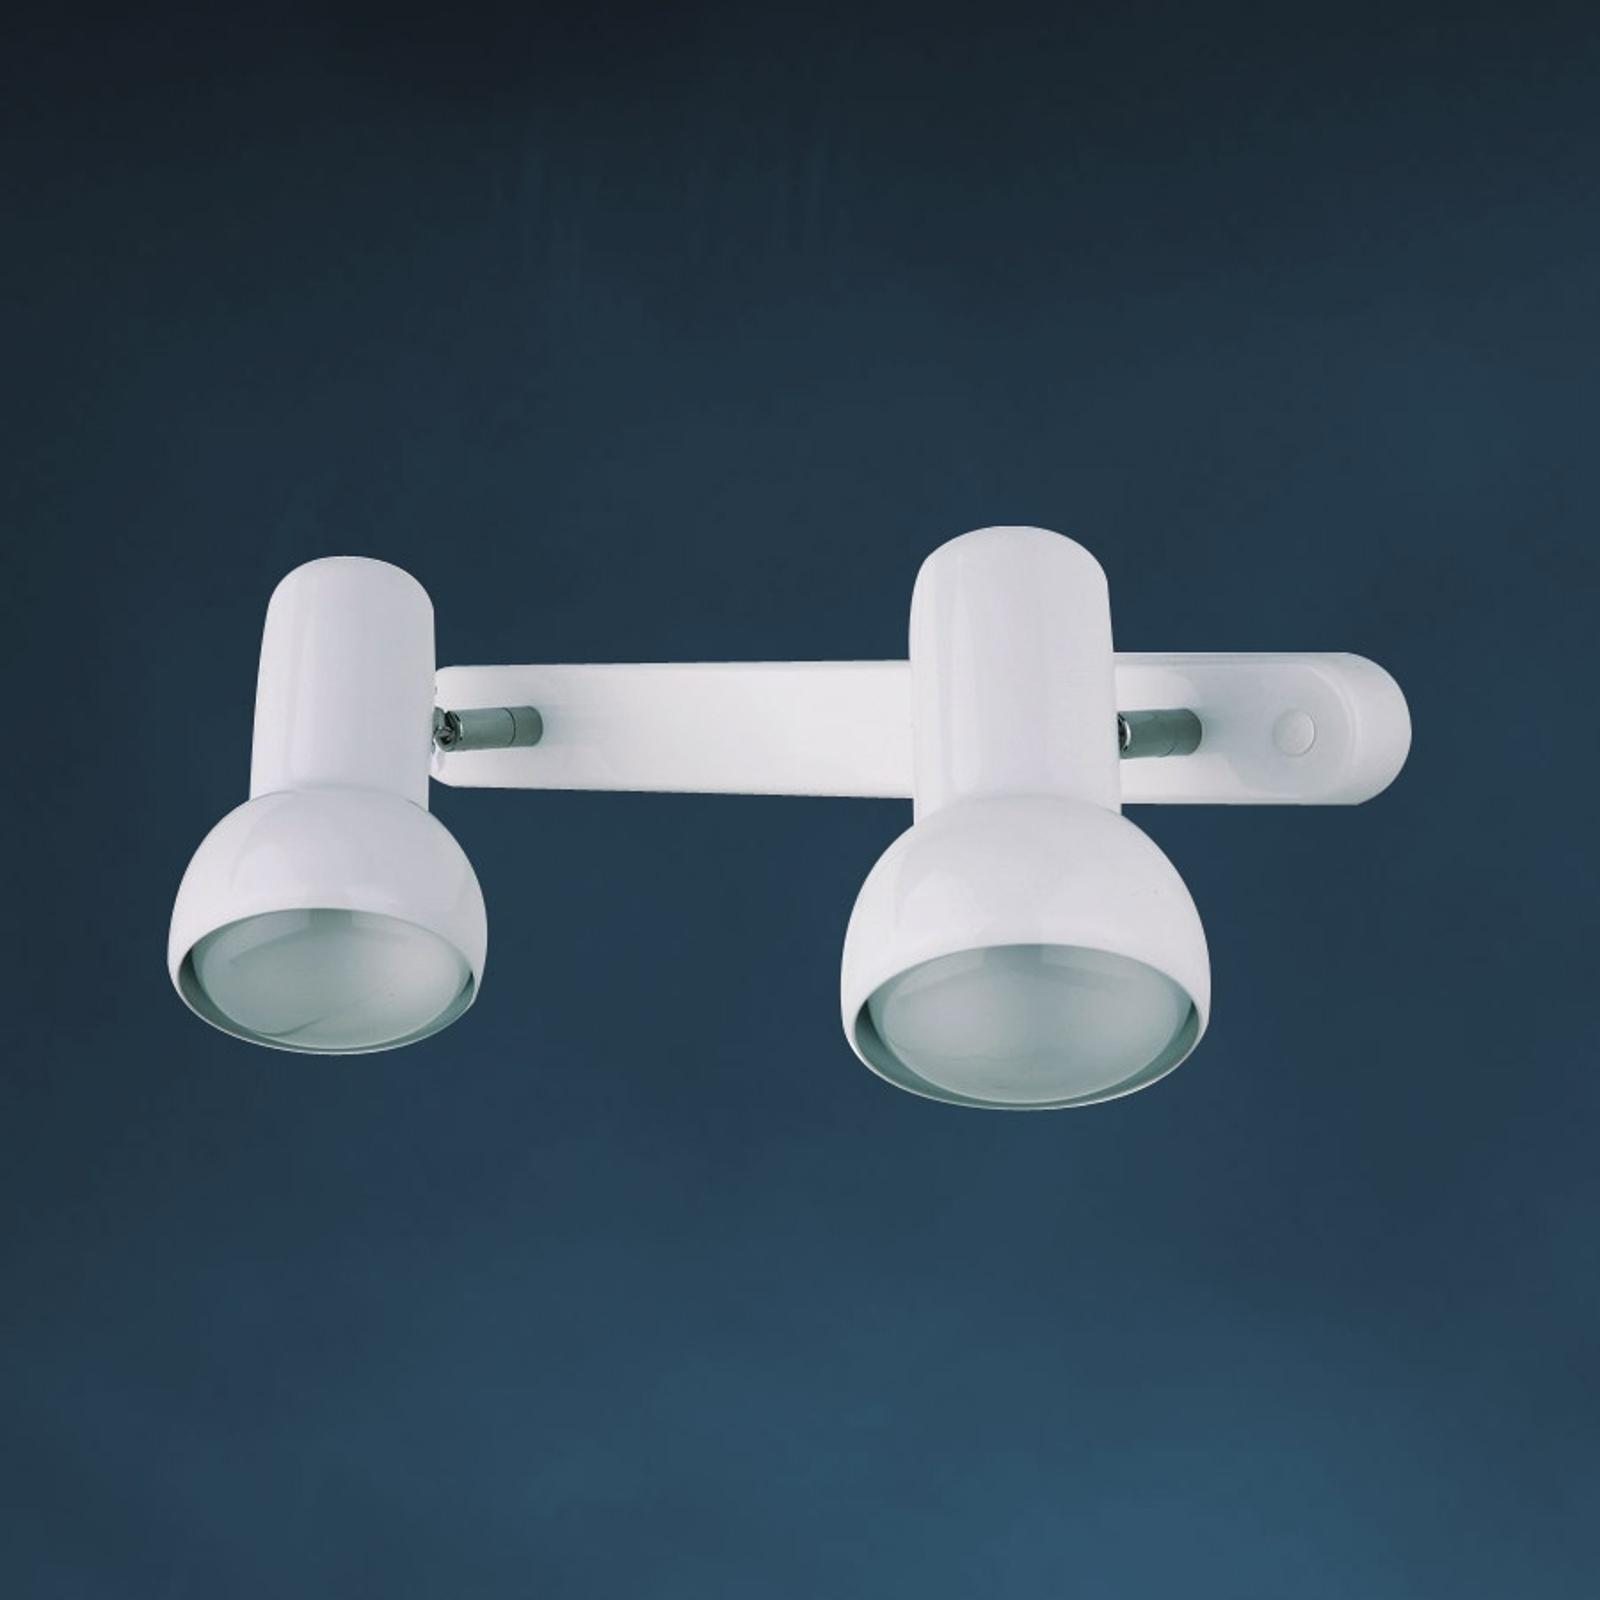 Aplique EIFEL en diseño retro, 2 luces